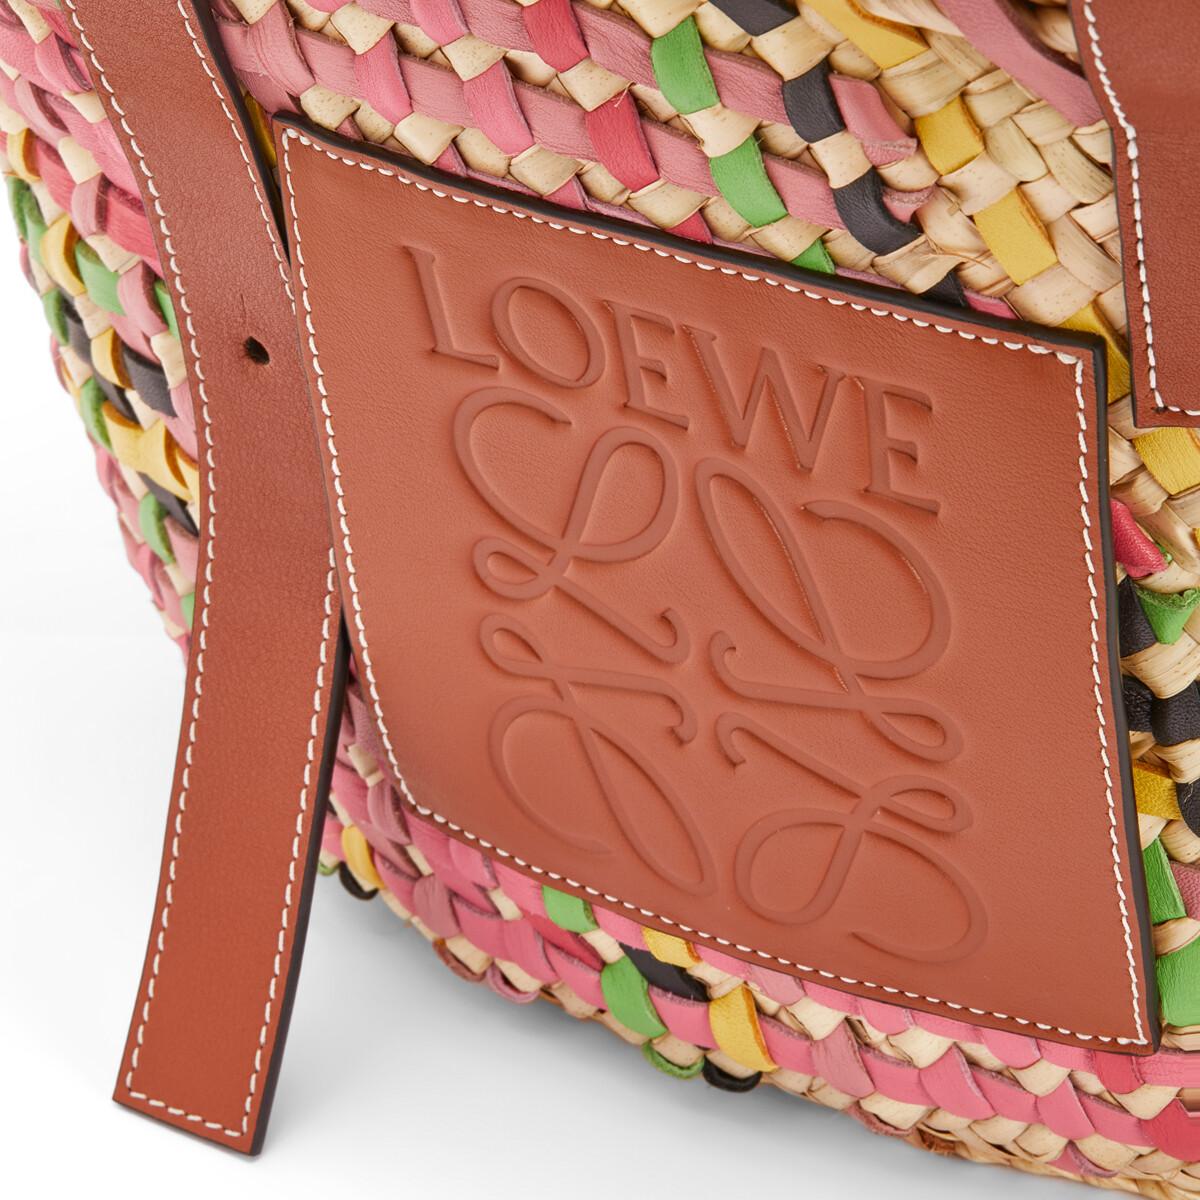 LOEWE Basket Bag Pink Multitone/Tan front